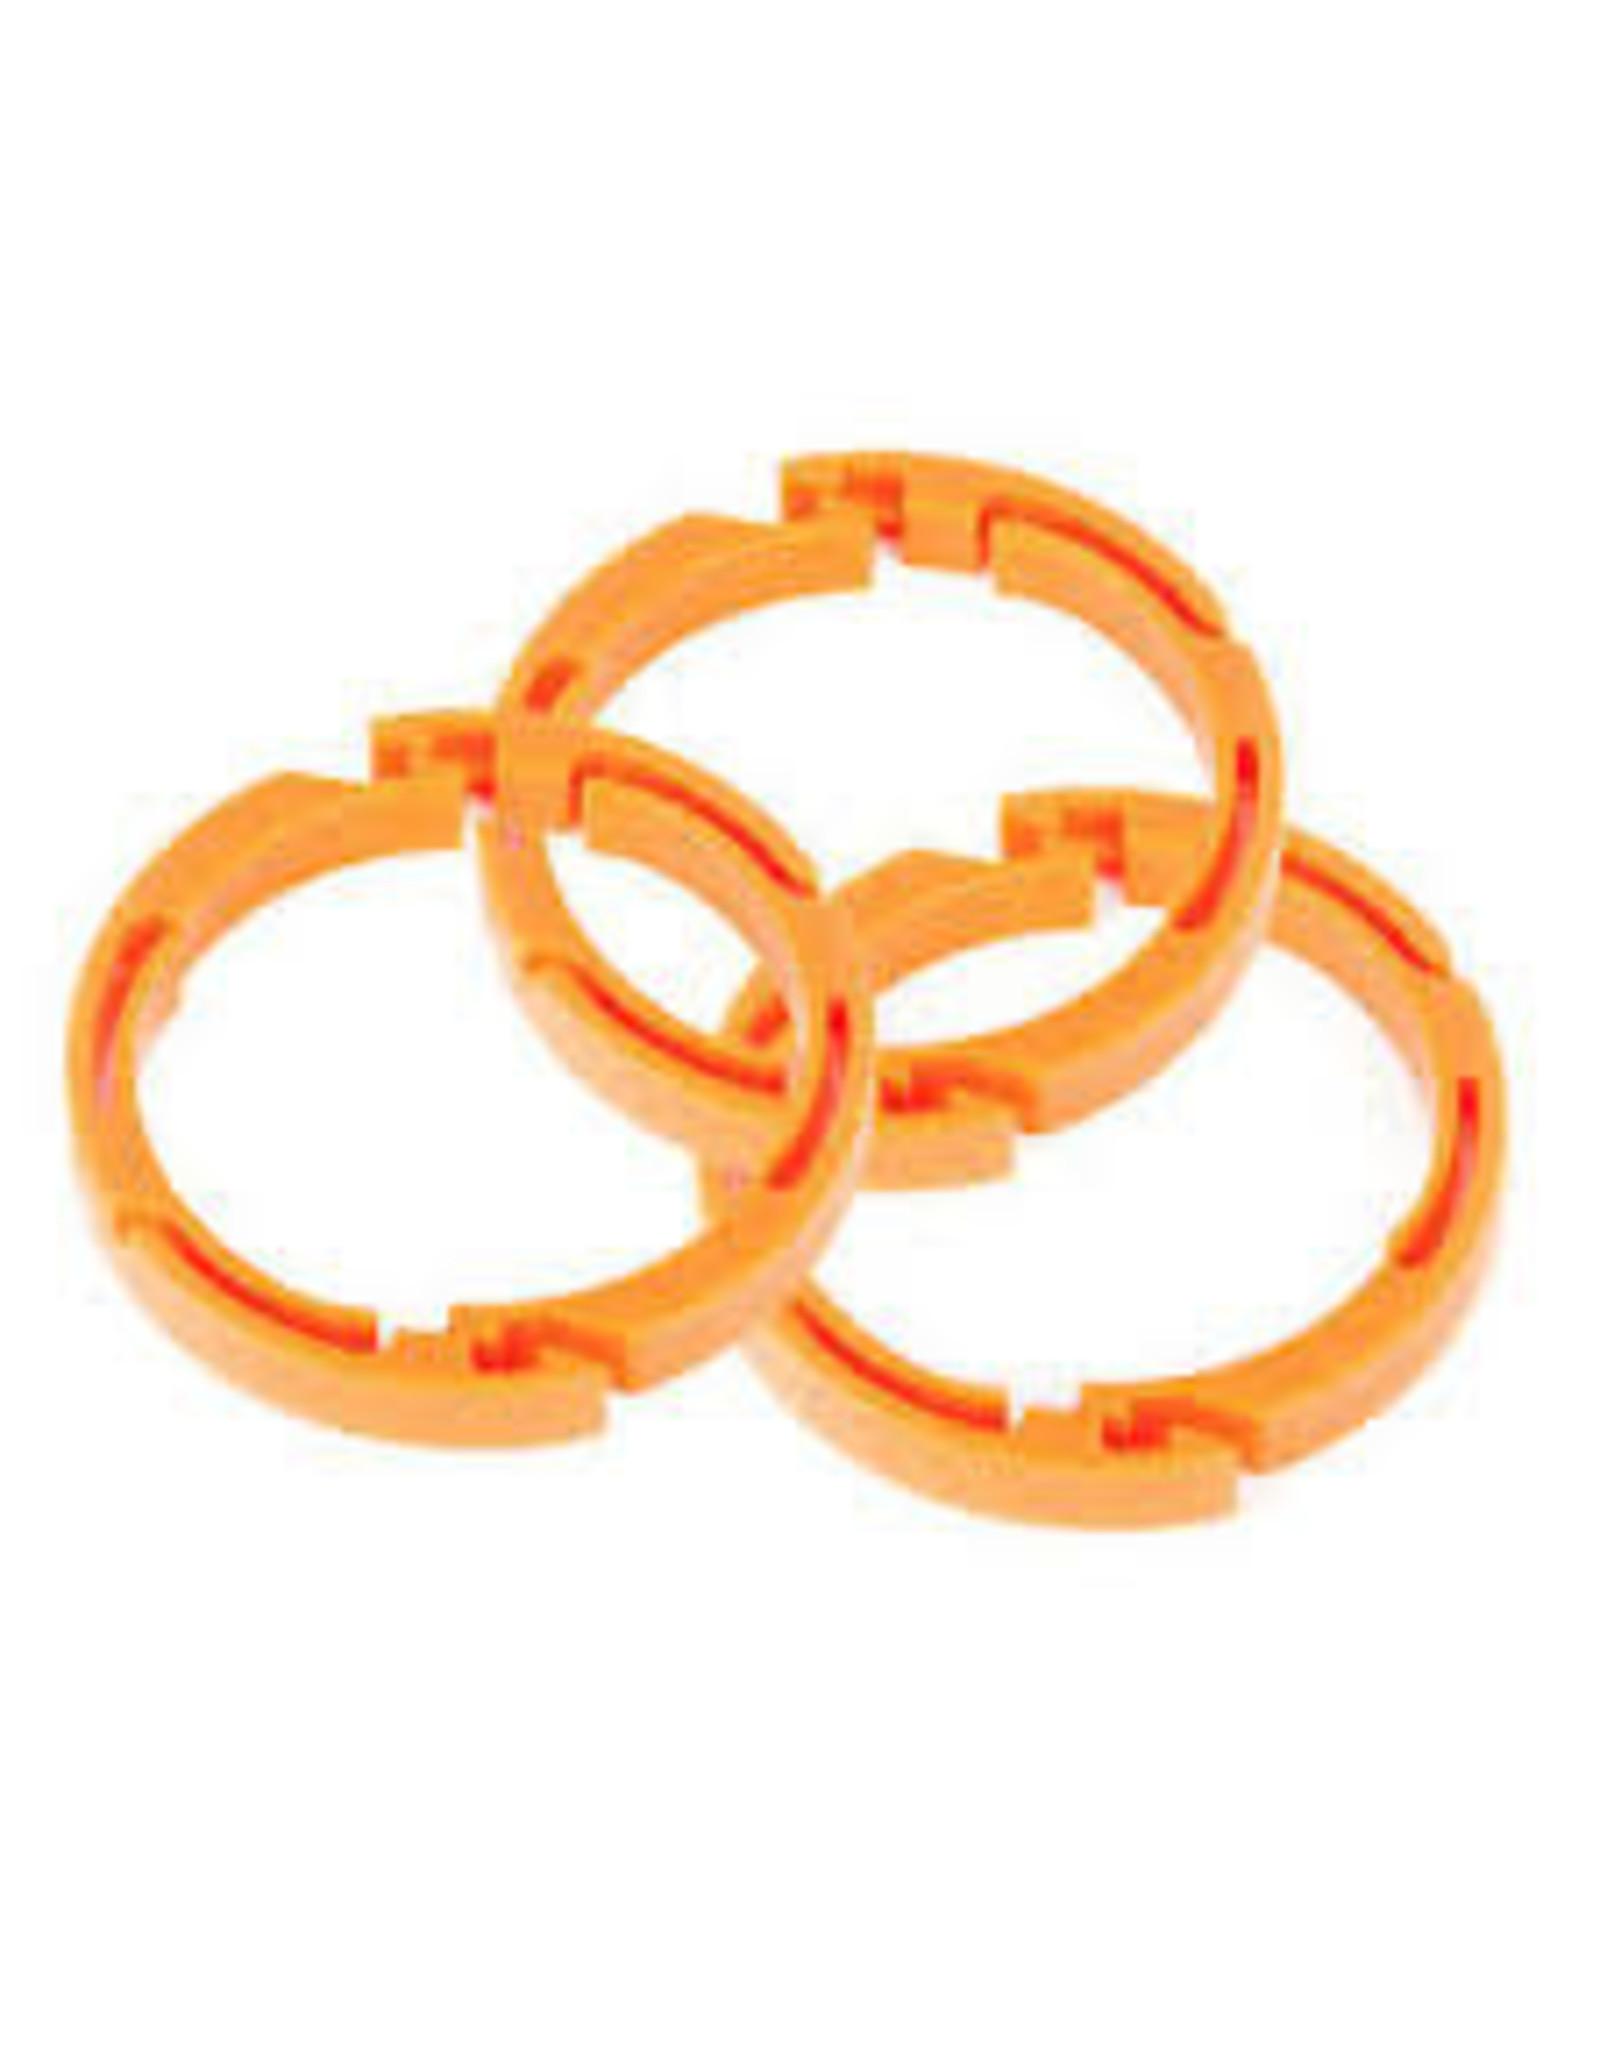 "Fox FOX Float X2 Volume Spacer Kit, 3 Pairs: Clip-in, Plastic, 0.25"""